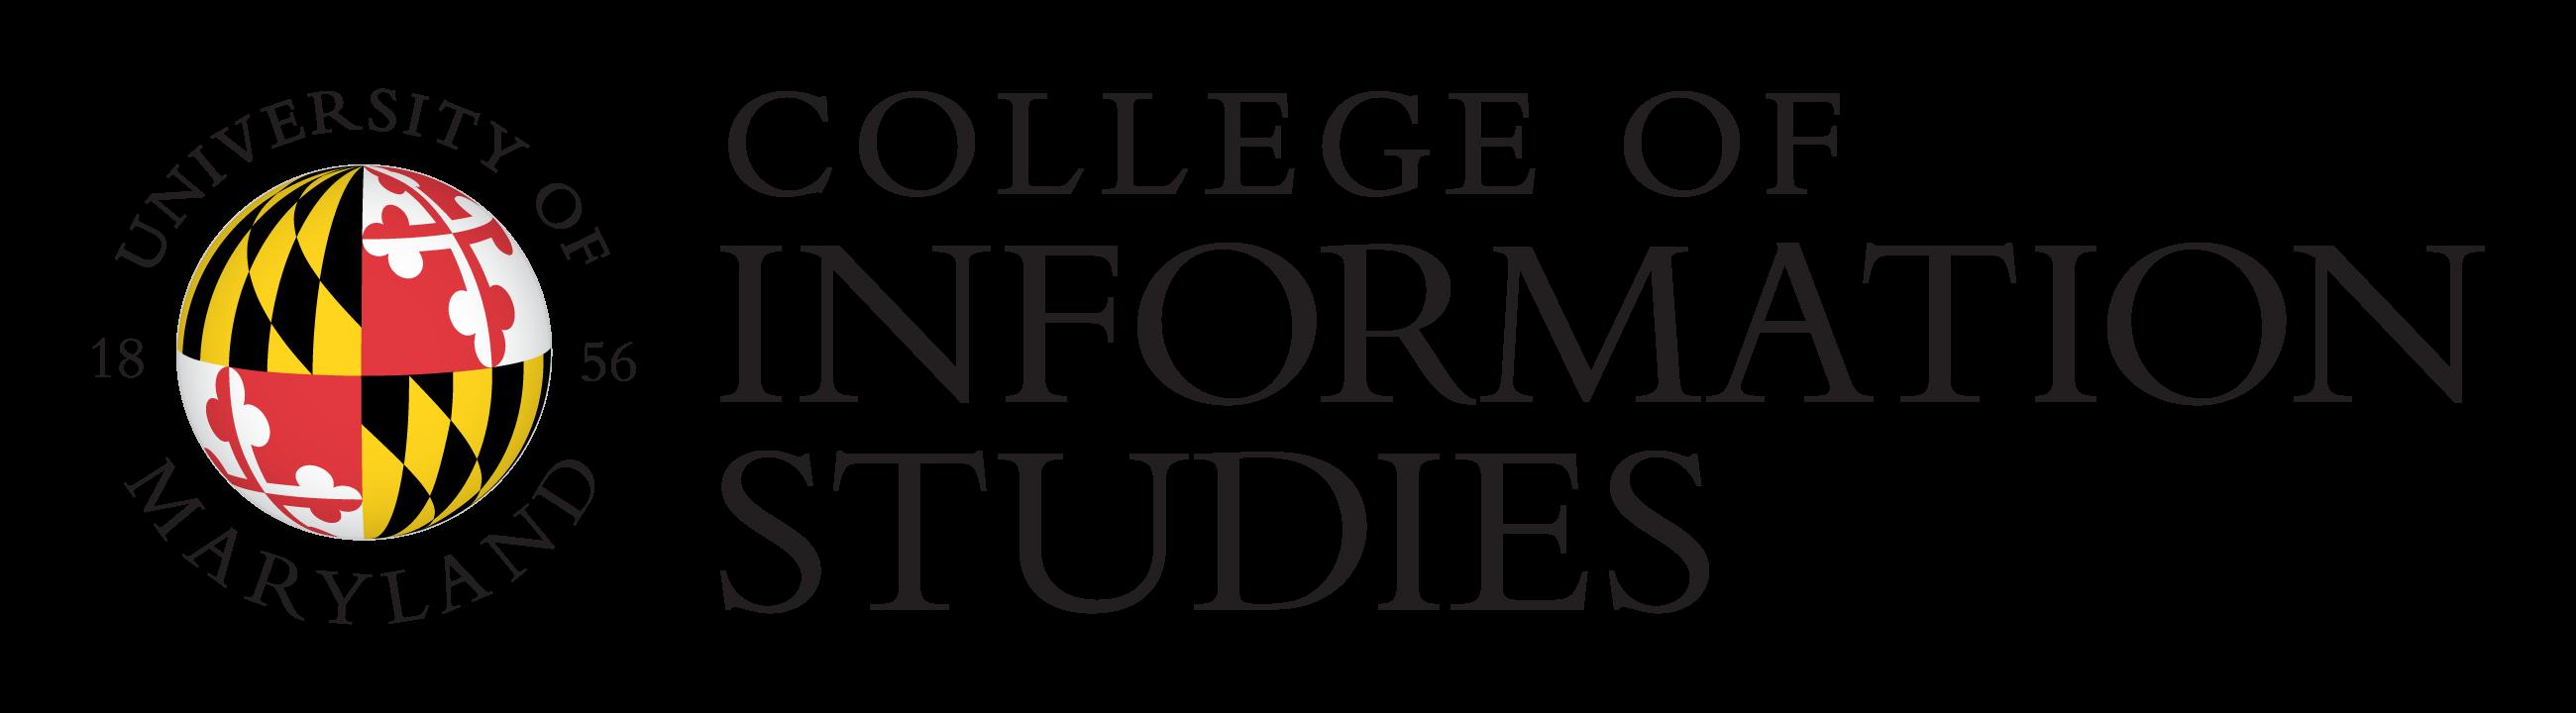 College of Information Studies